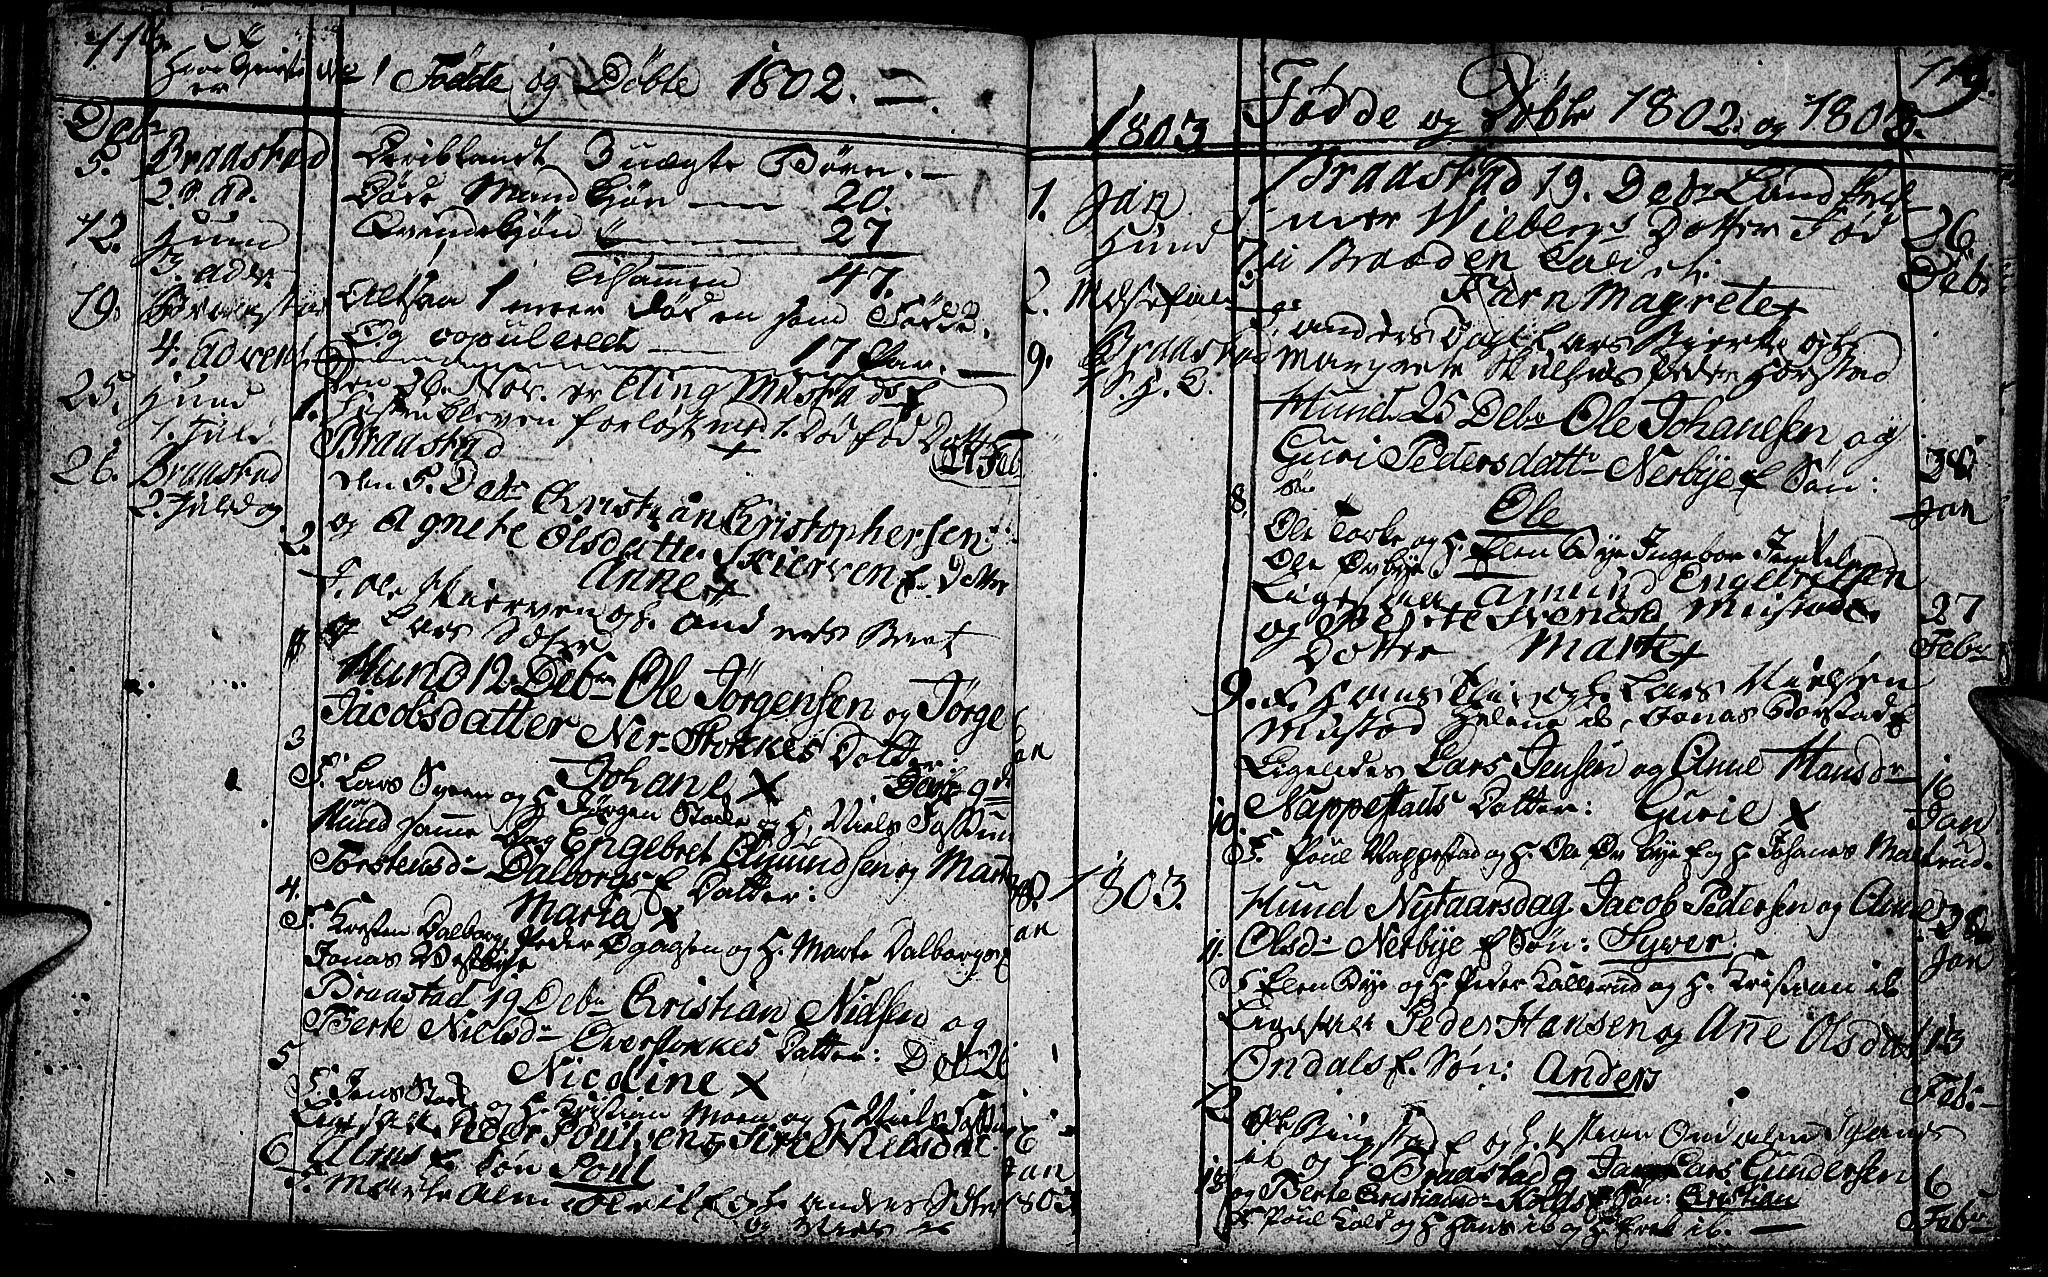 SAH, Vardal prestekontor, H/Ha/Hab/L0002: Klokkerbok nr. 2, 1790-1803, s. 118-119